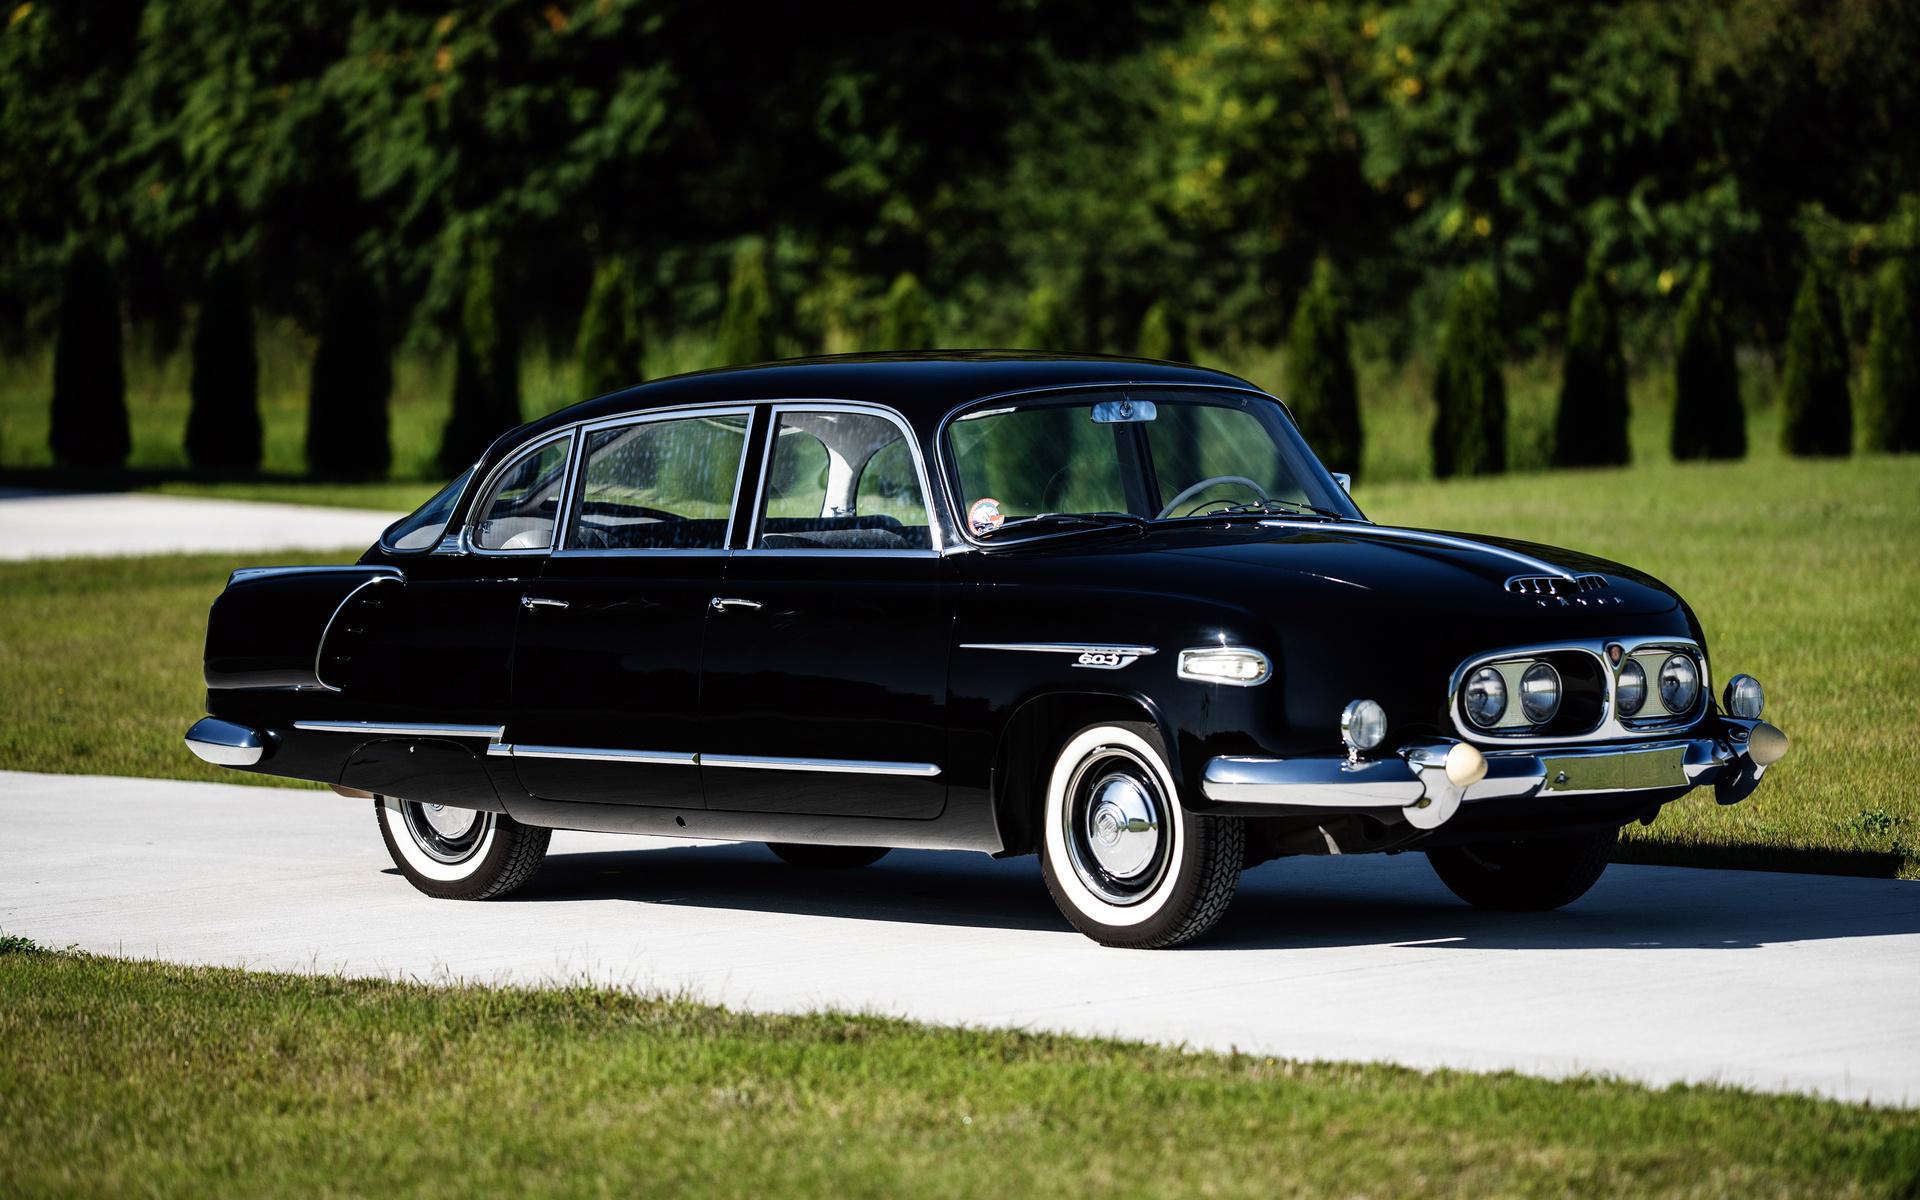 tatra t2-603, 4k, retro cars, 1965 cars, luxury cars, 1965 tatra t2-603, tatra